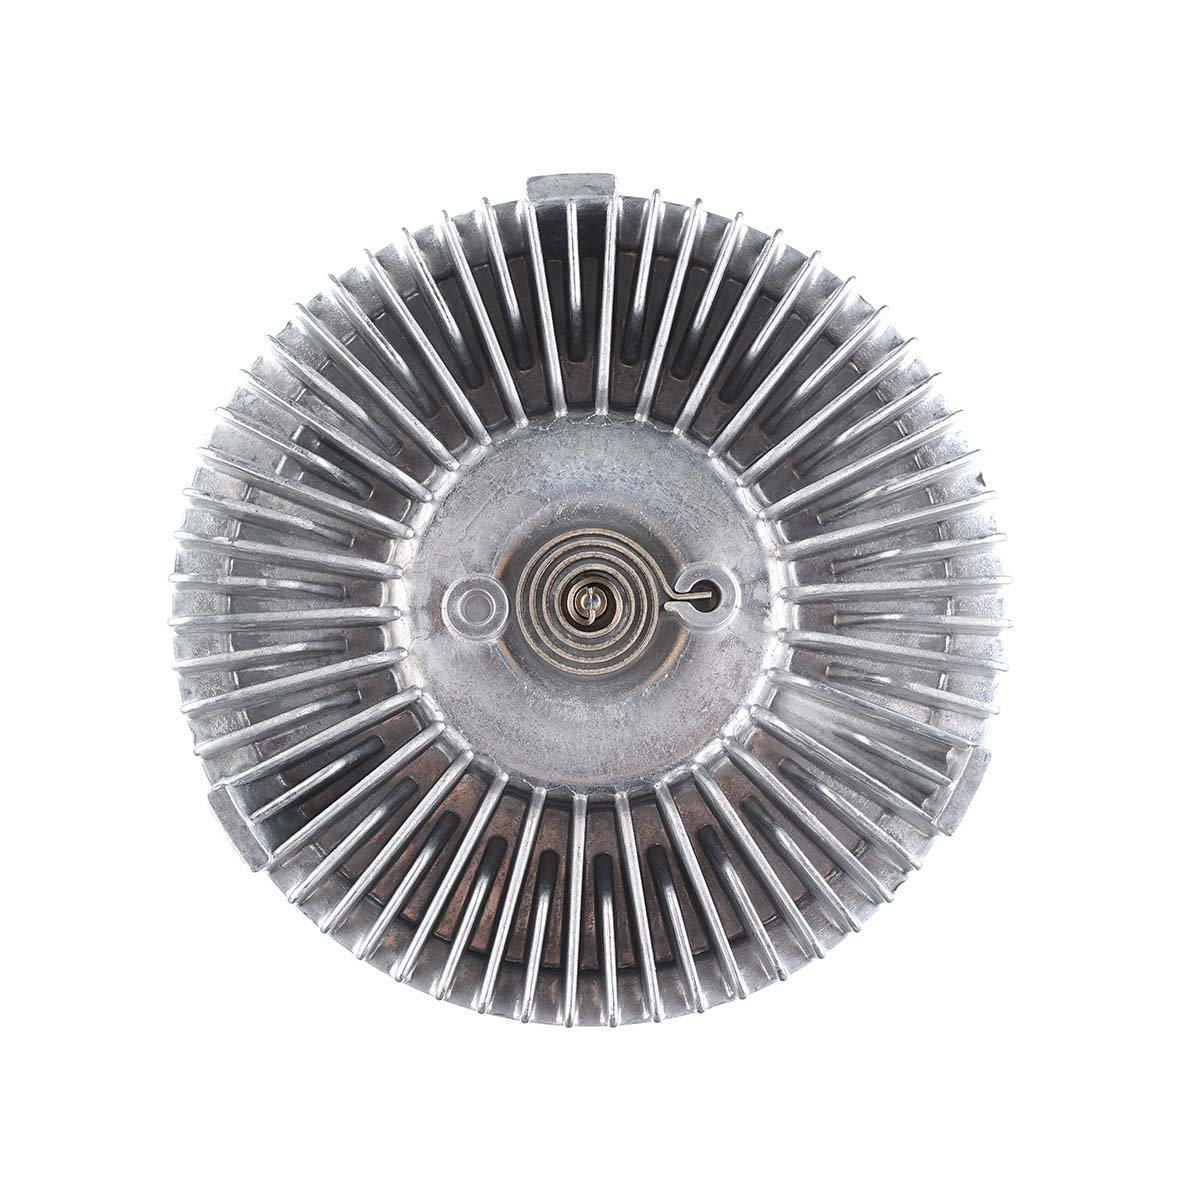 A-Premium Engine Cooling Fan Clutch for Ford Ranger 1998-2011 Explorer 1998-2001 Explorer Sport Trac Mazda B4000 Mercury Mountaineer 4.0L